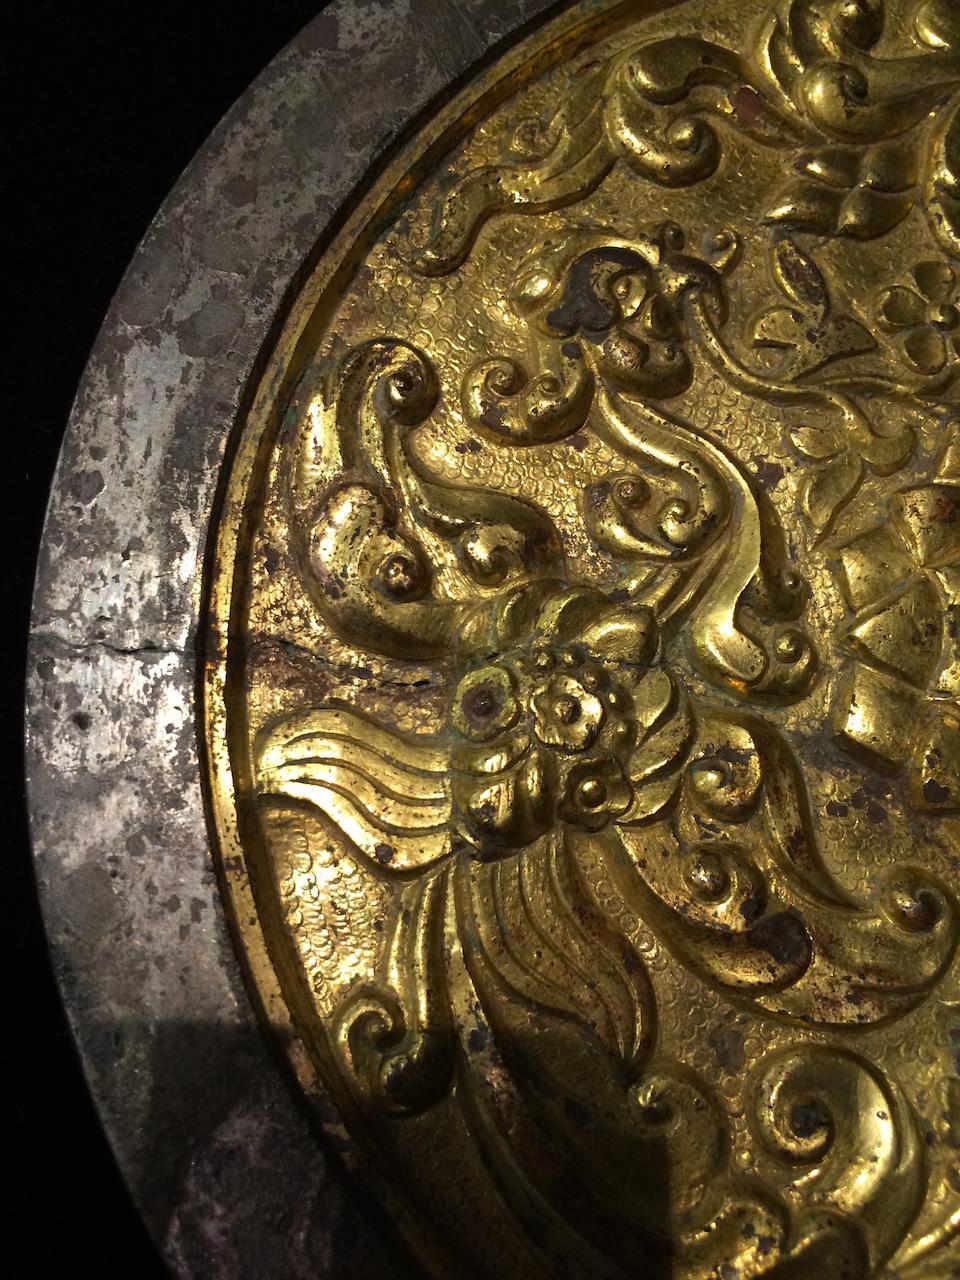 A rare gold overlay silvered bronze mirror 9th-13th century